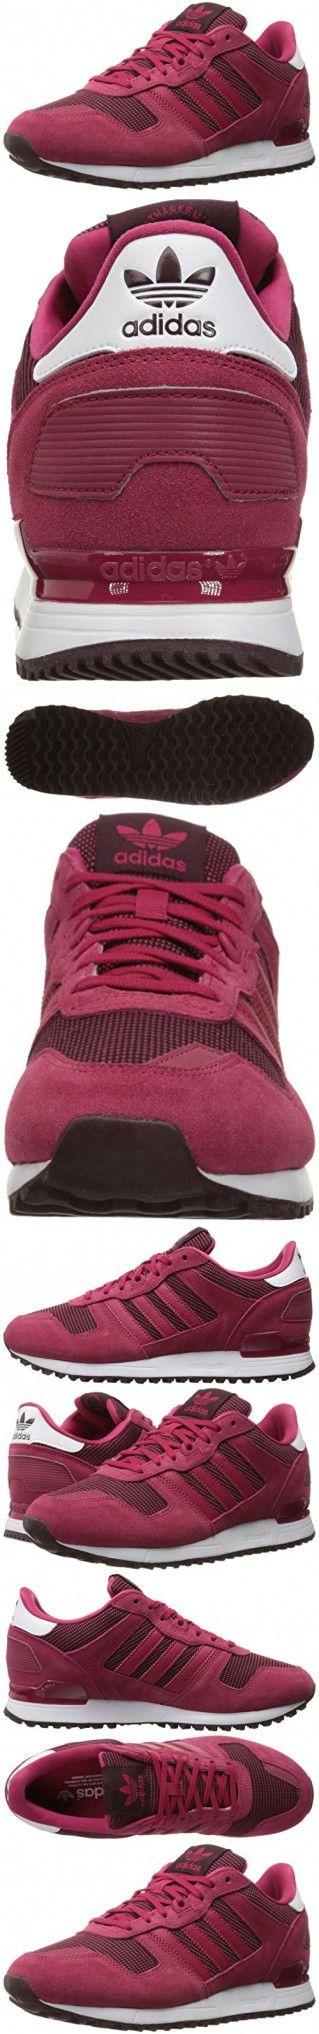 Adidas Originals Women's ZX 700 W Fashion Sneaker, Unity Pink F16/Unity Pink F16/Light Maroon, 7.5 M US